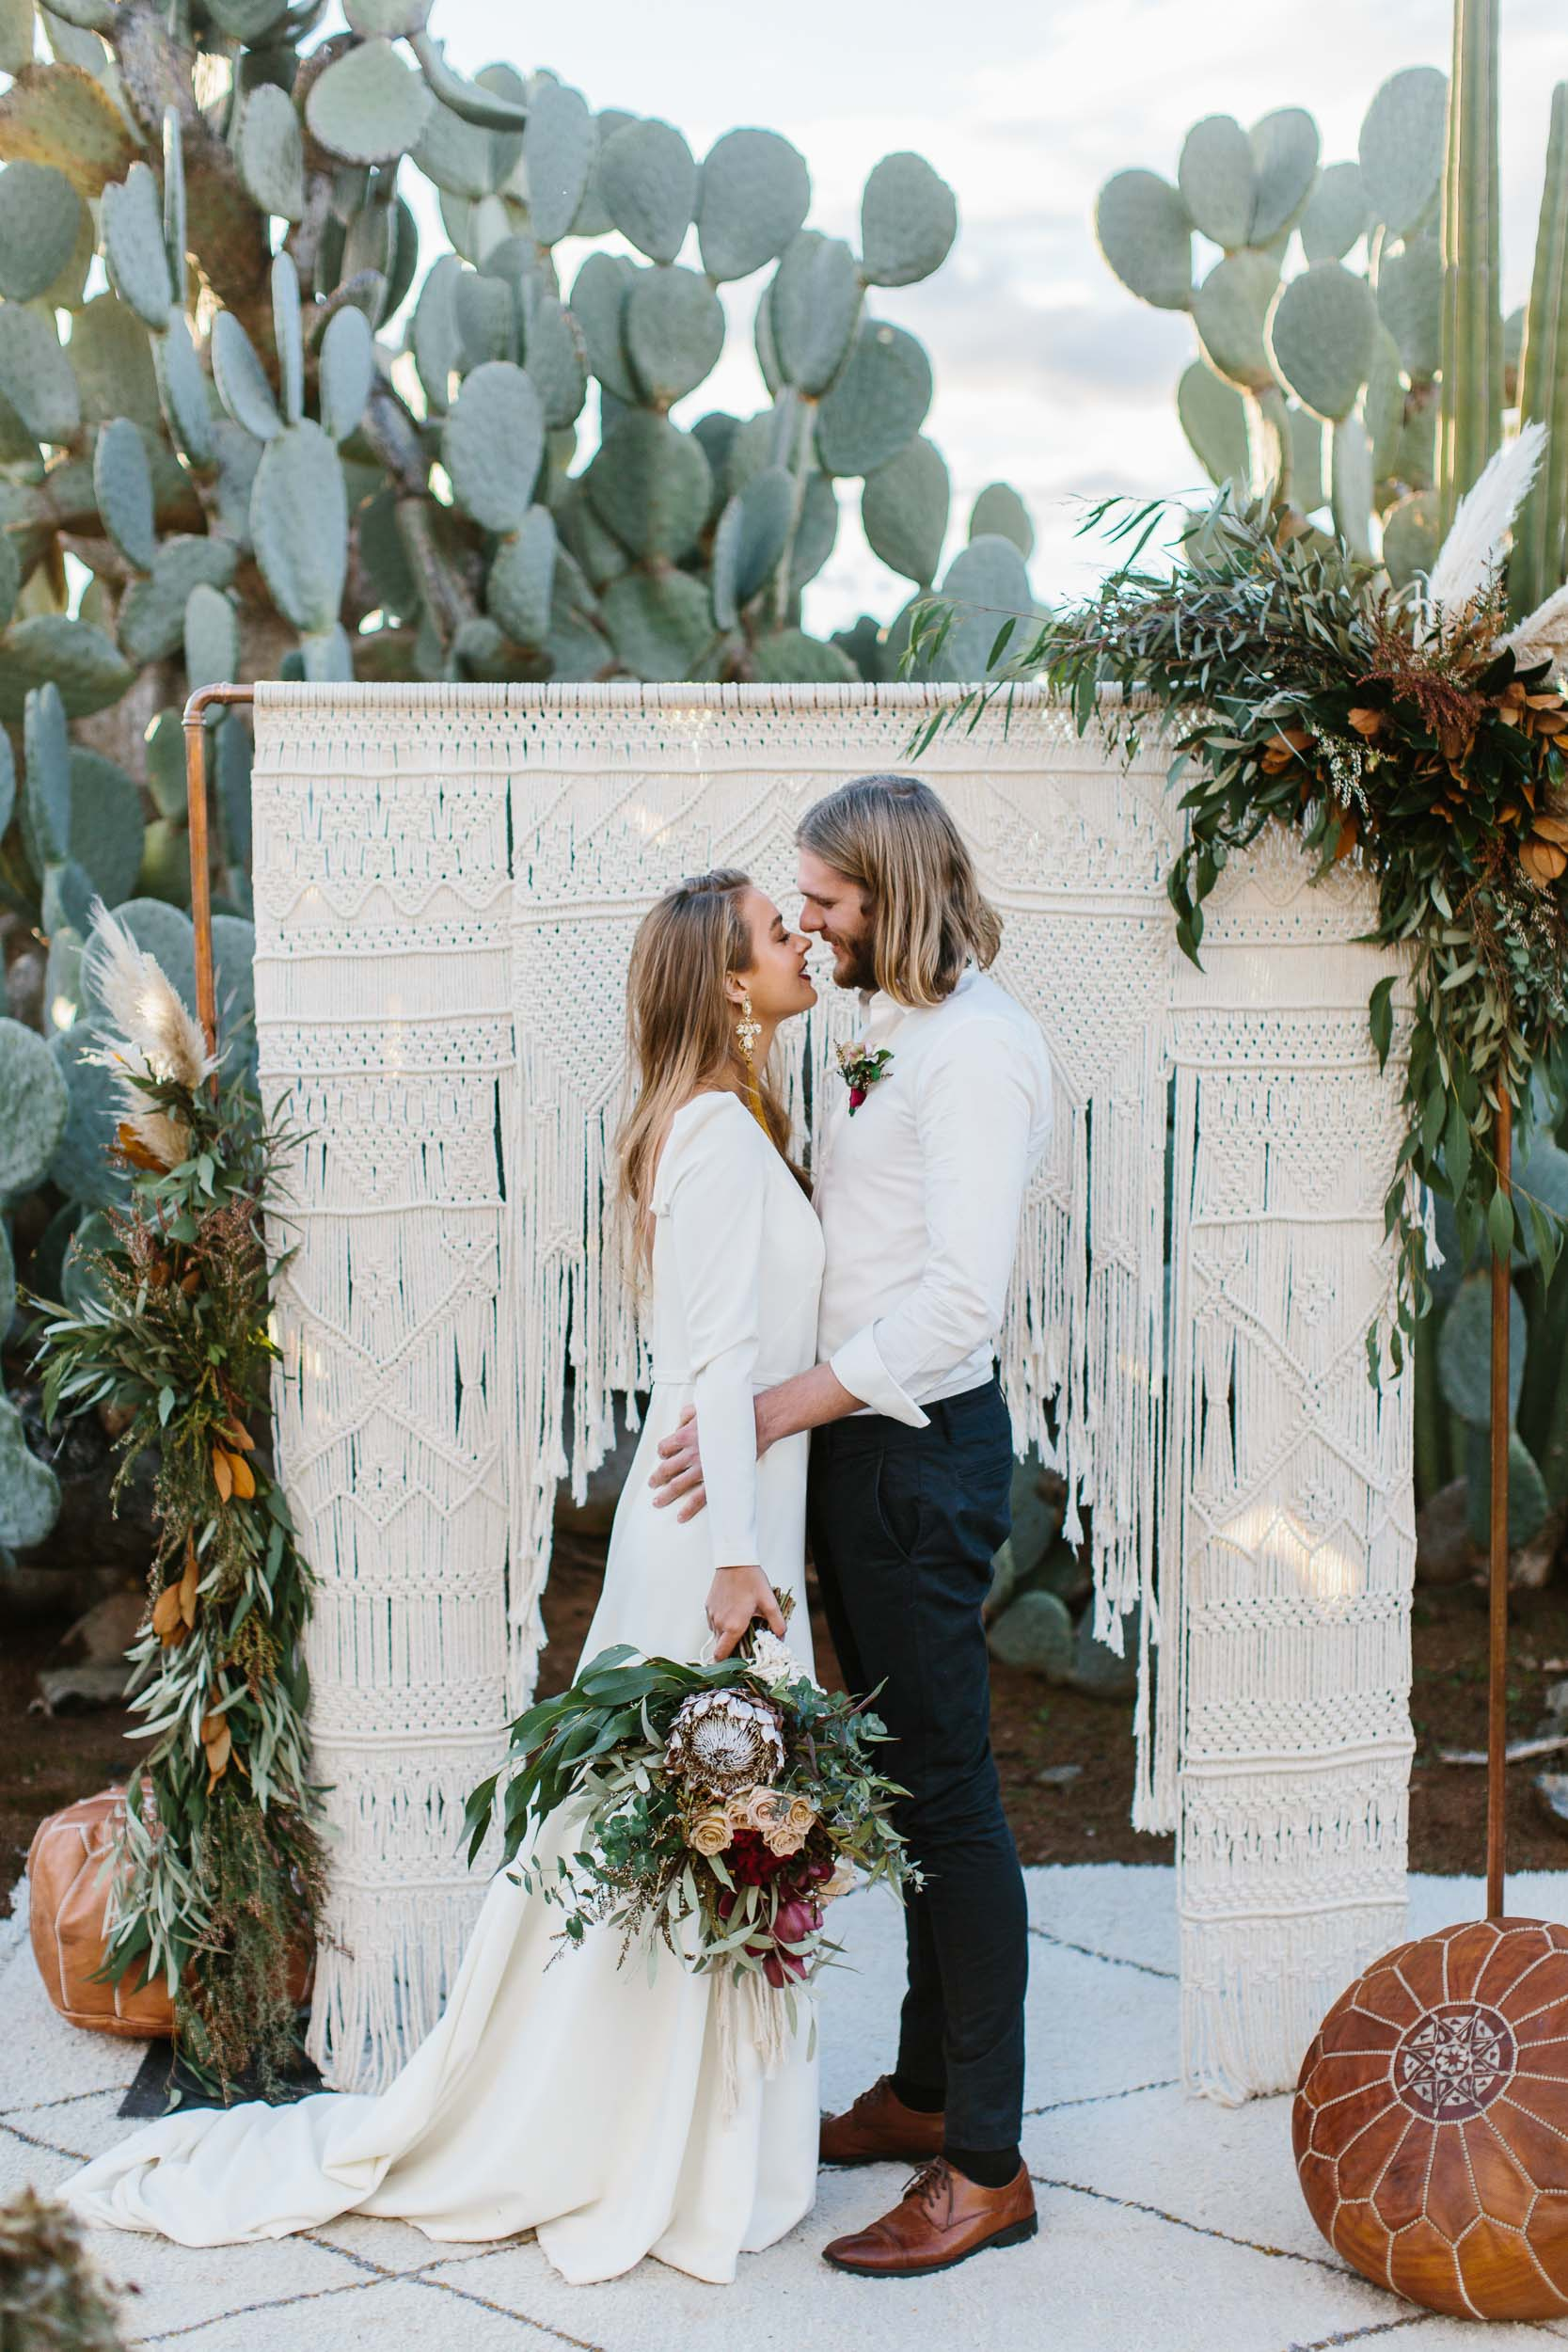 Kas-Richards-Ruby-and-James-Stylist-Cactus-Country-Karen-Willis-Holmes-Bridal-One-Heart-Studios-Boho-Wedding-100.jpg